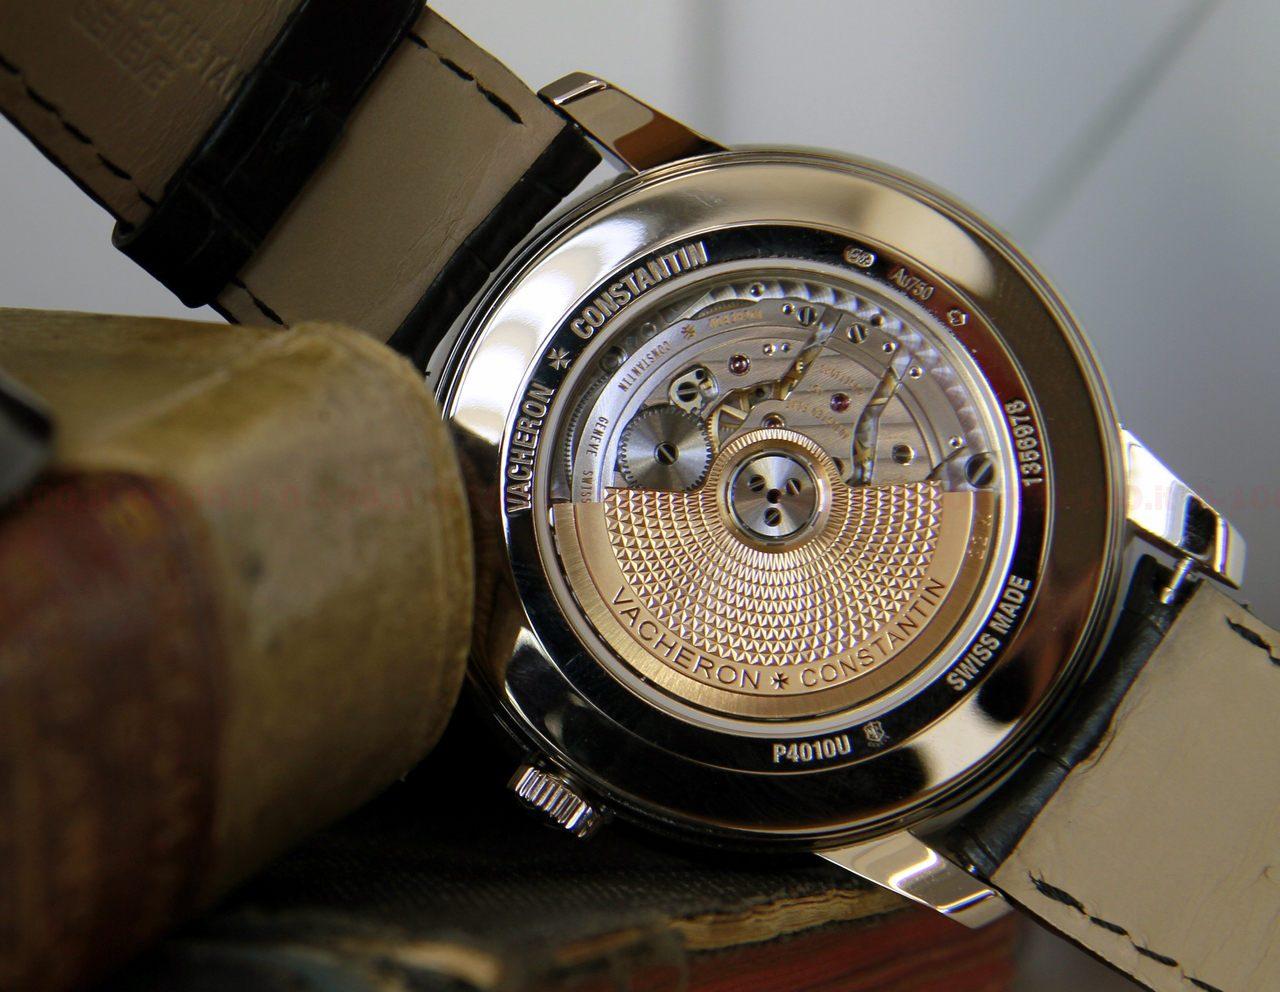 test-watch-sihh-2017-vacheron-constantin-patrimony-fasi-lunari-e-calendario-retrogrado-ref-4010u000g-b330-prezzo-price_0-10024